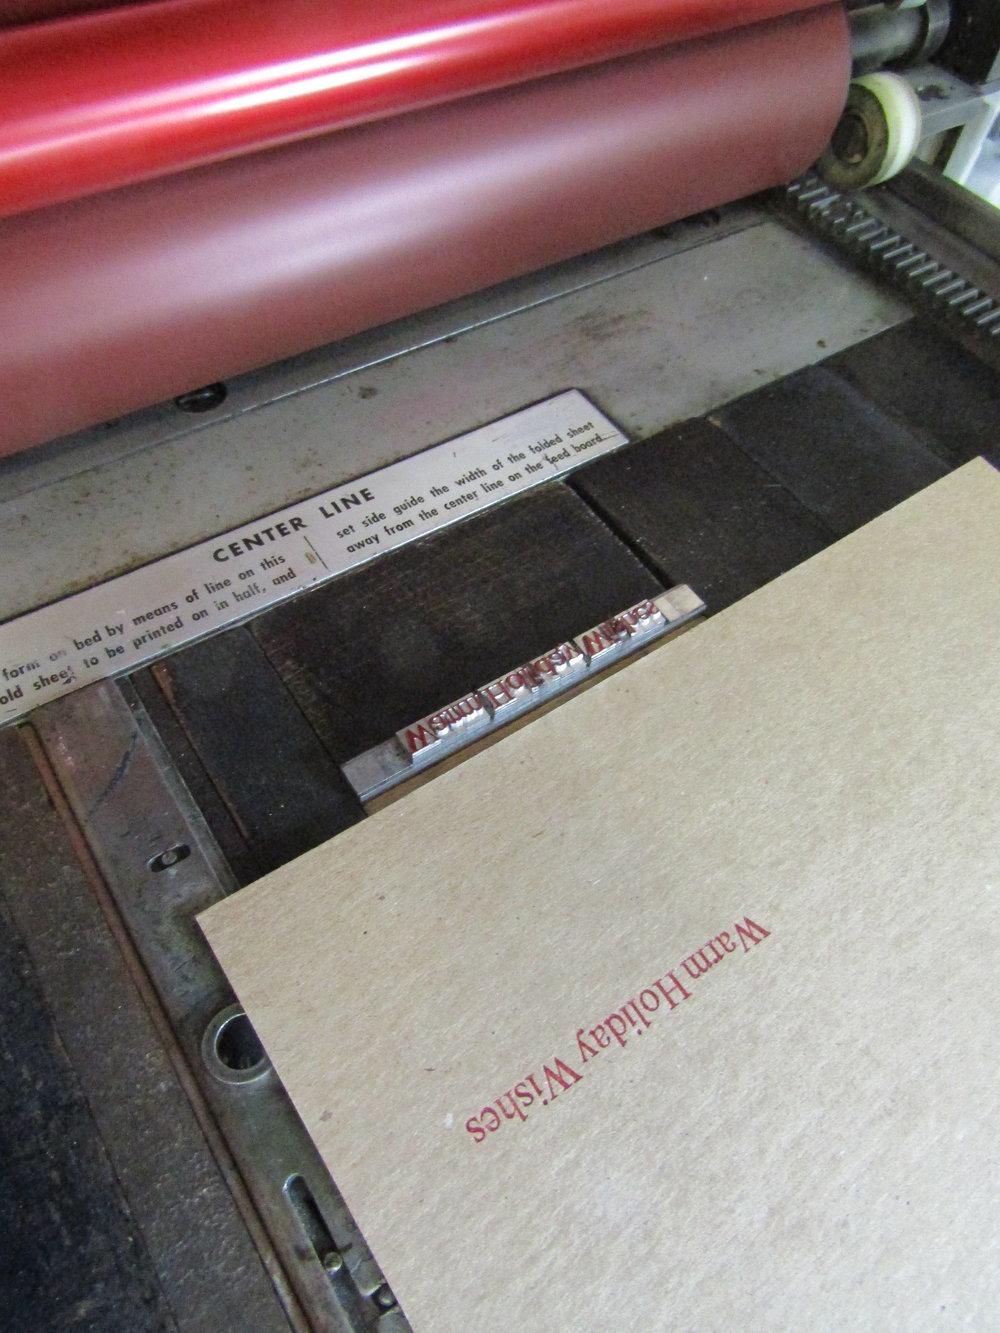 Printing the interior message using 24 pt Garamond metal type.